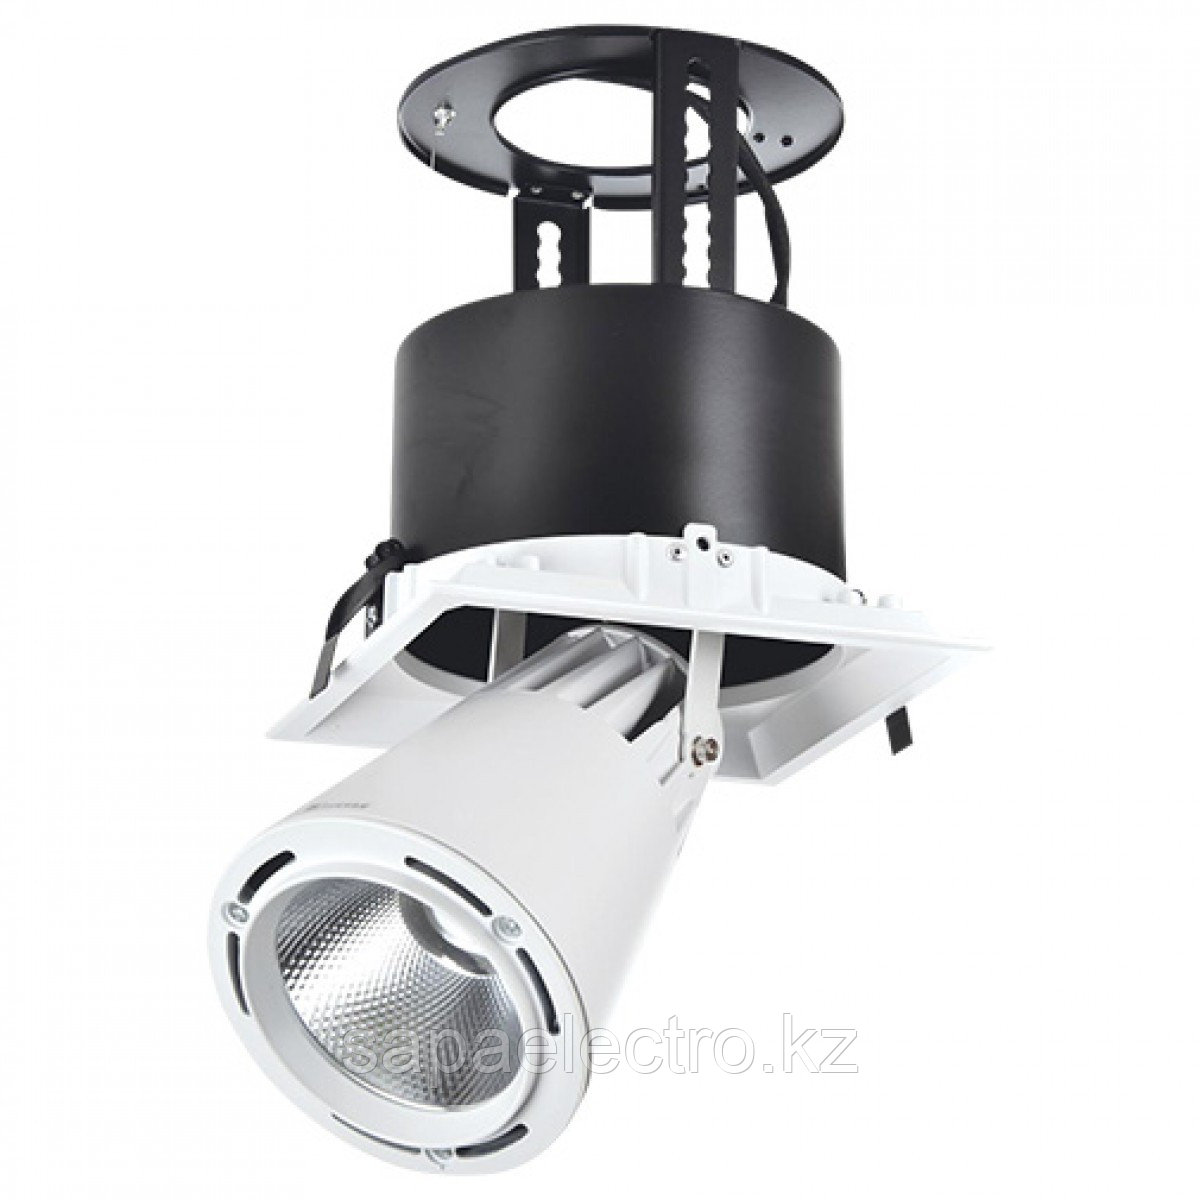 Св-к DOWNLIGHT LED LS-DK911-1 40W 5700K WHITE (TS)8